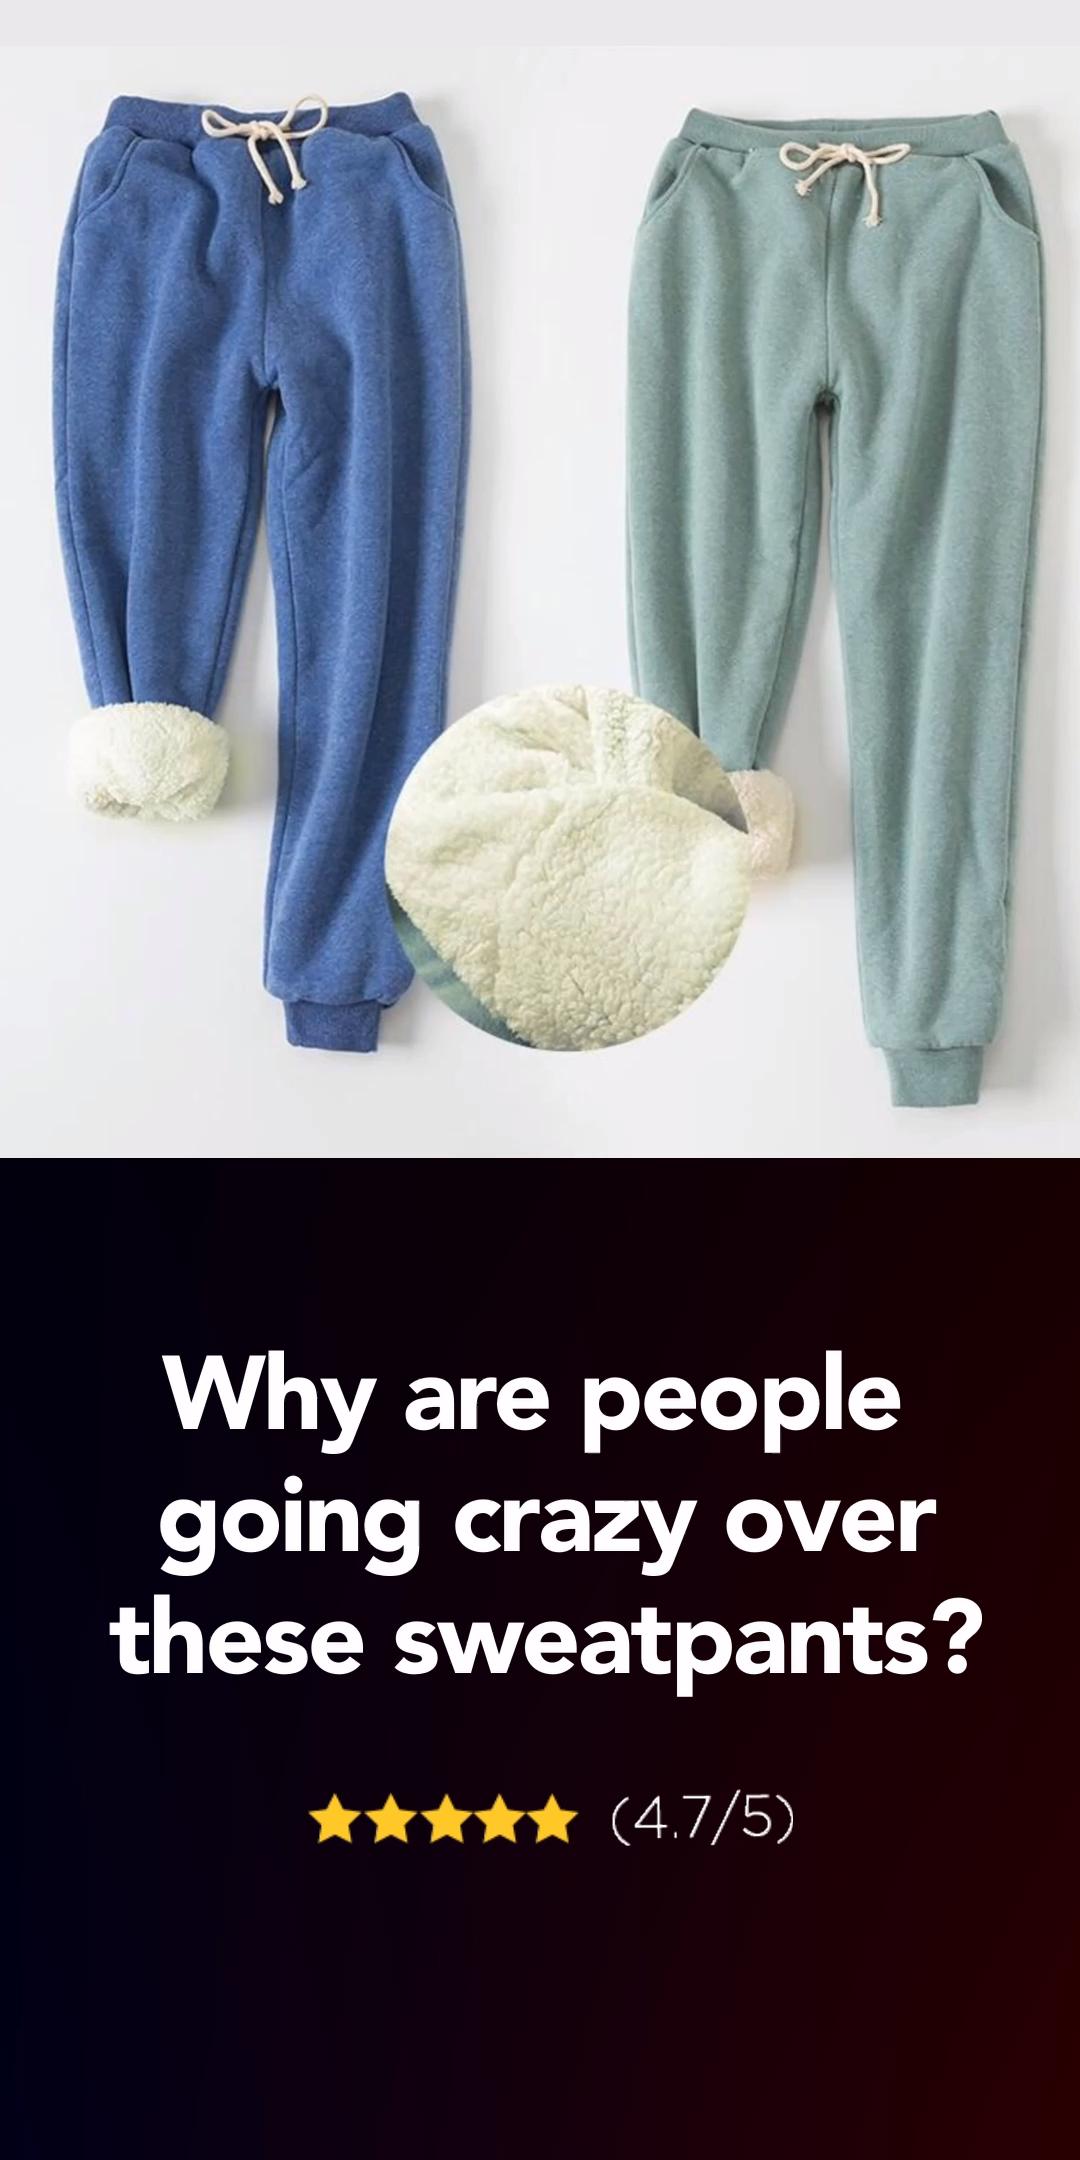 The world's coziest sweatpants.